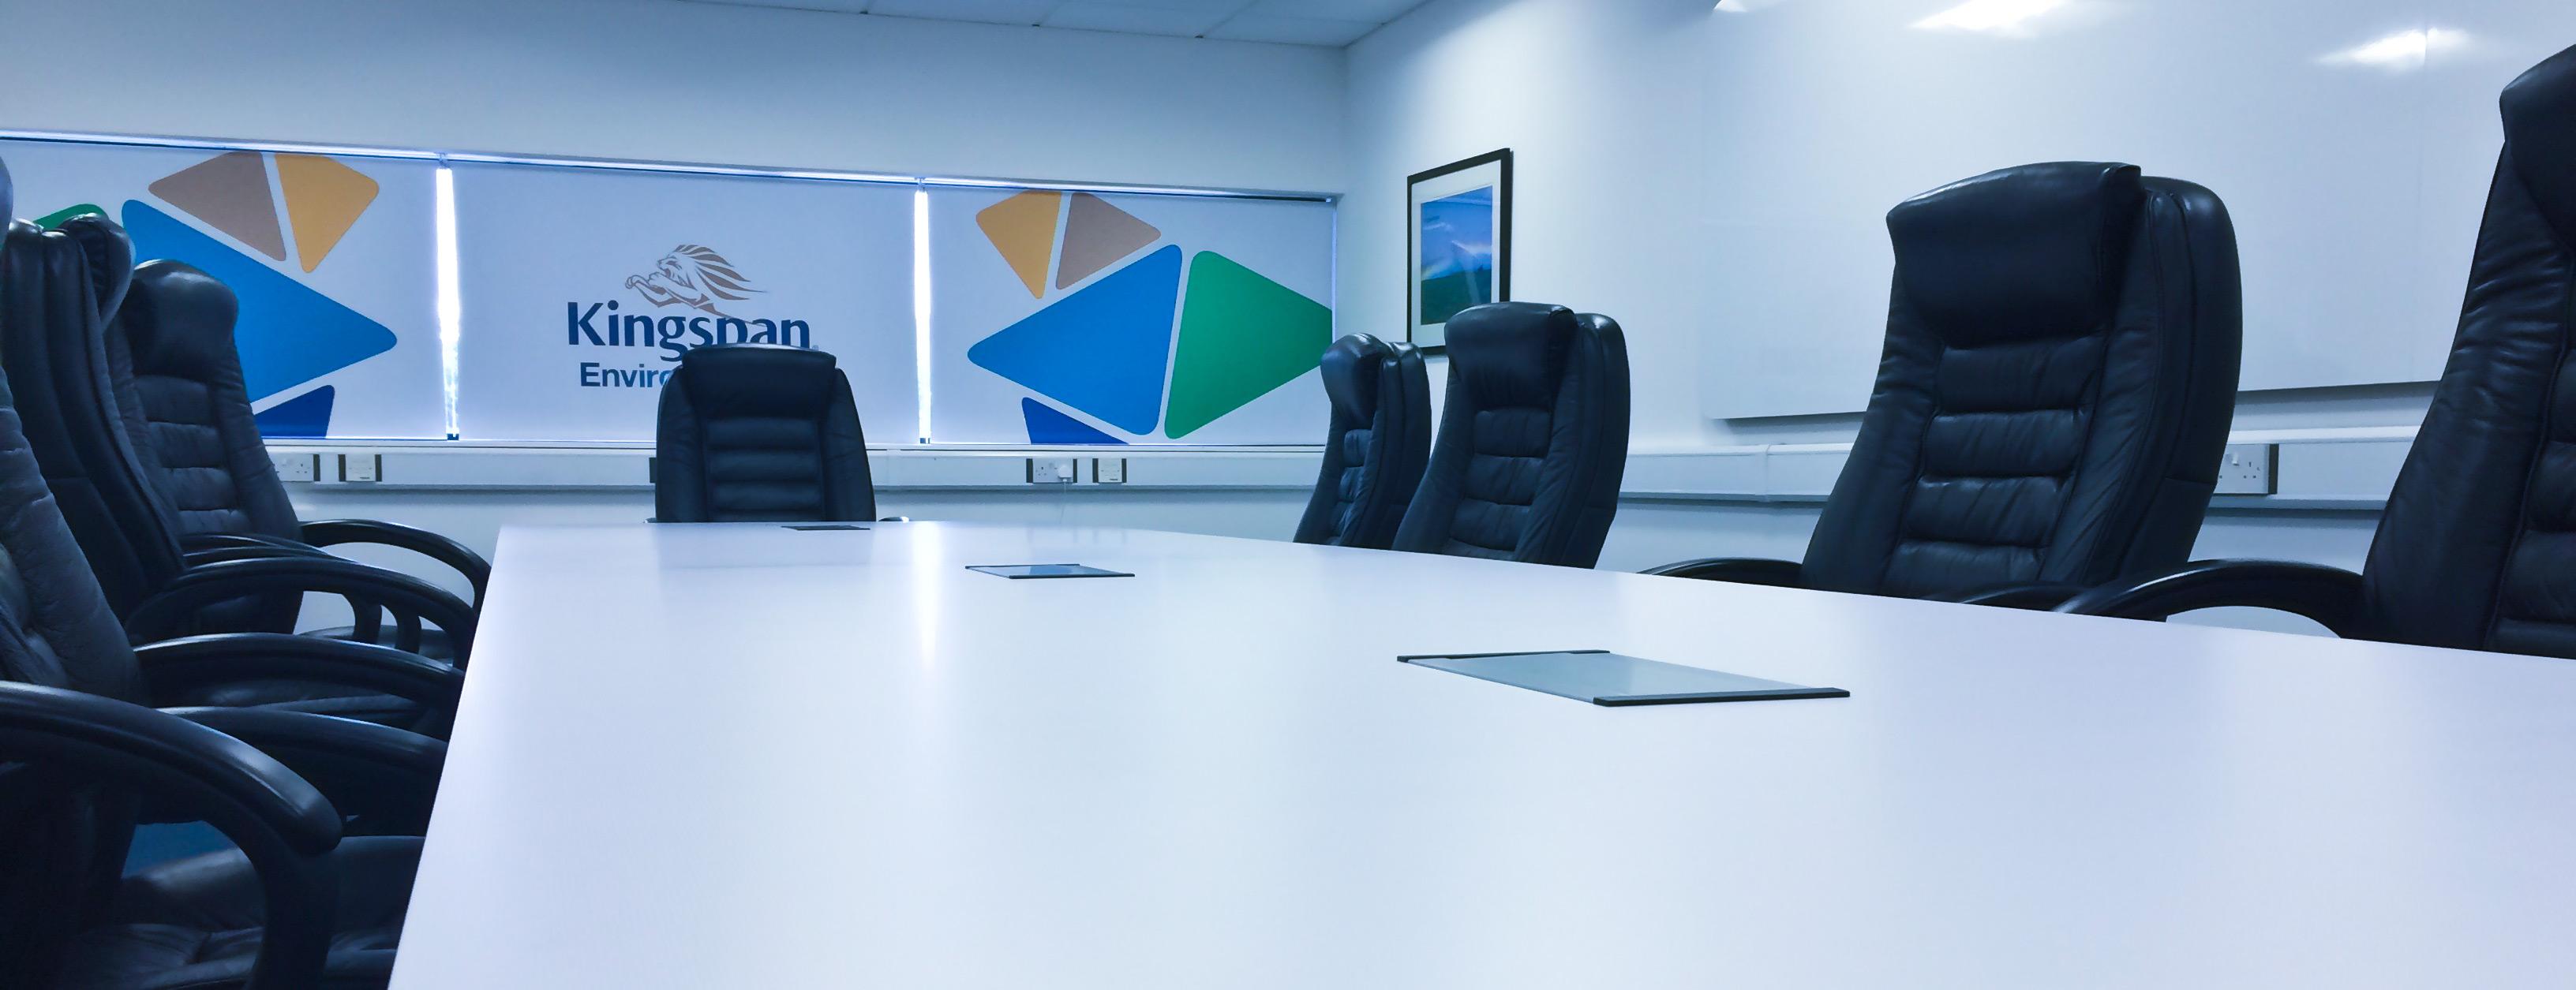 printed blinds bespoke board room table